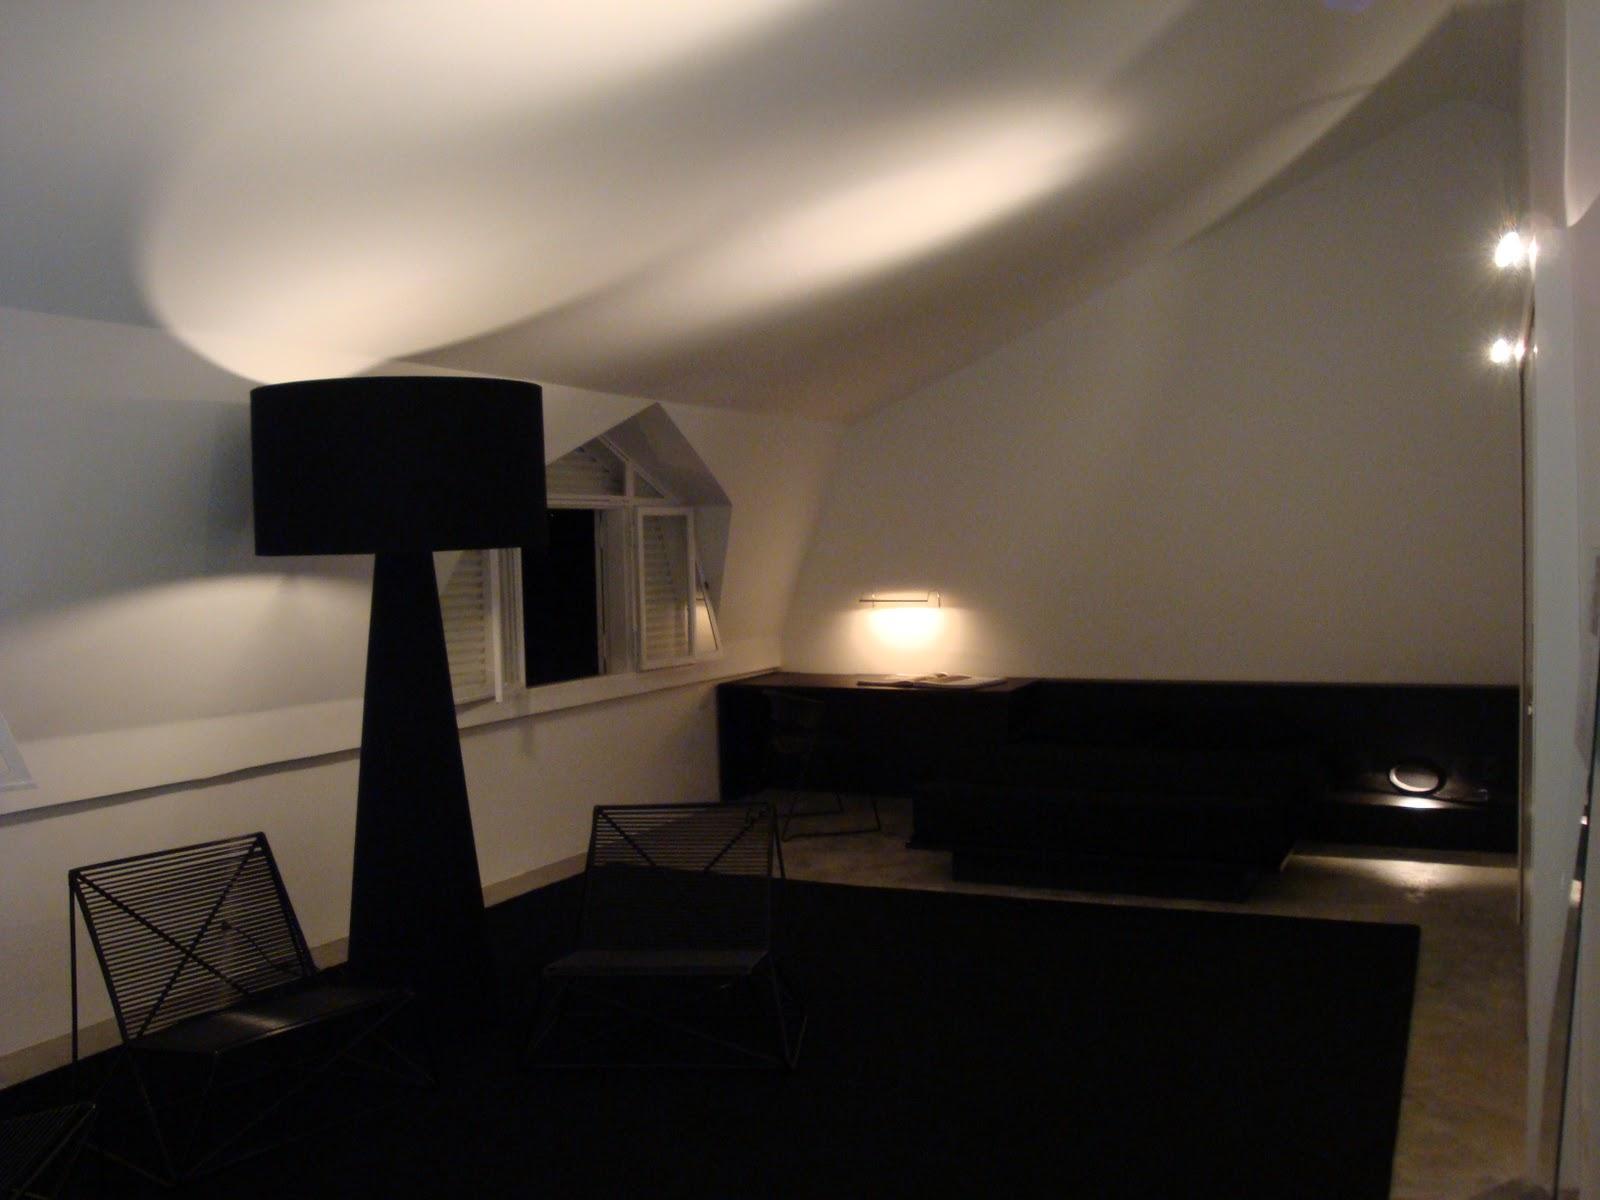 KVMDlivespaces+design: KVMDlivespaces+design na Haus Innen - CASA ...